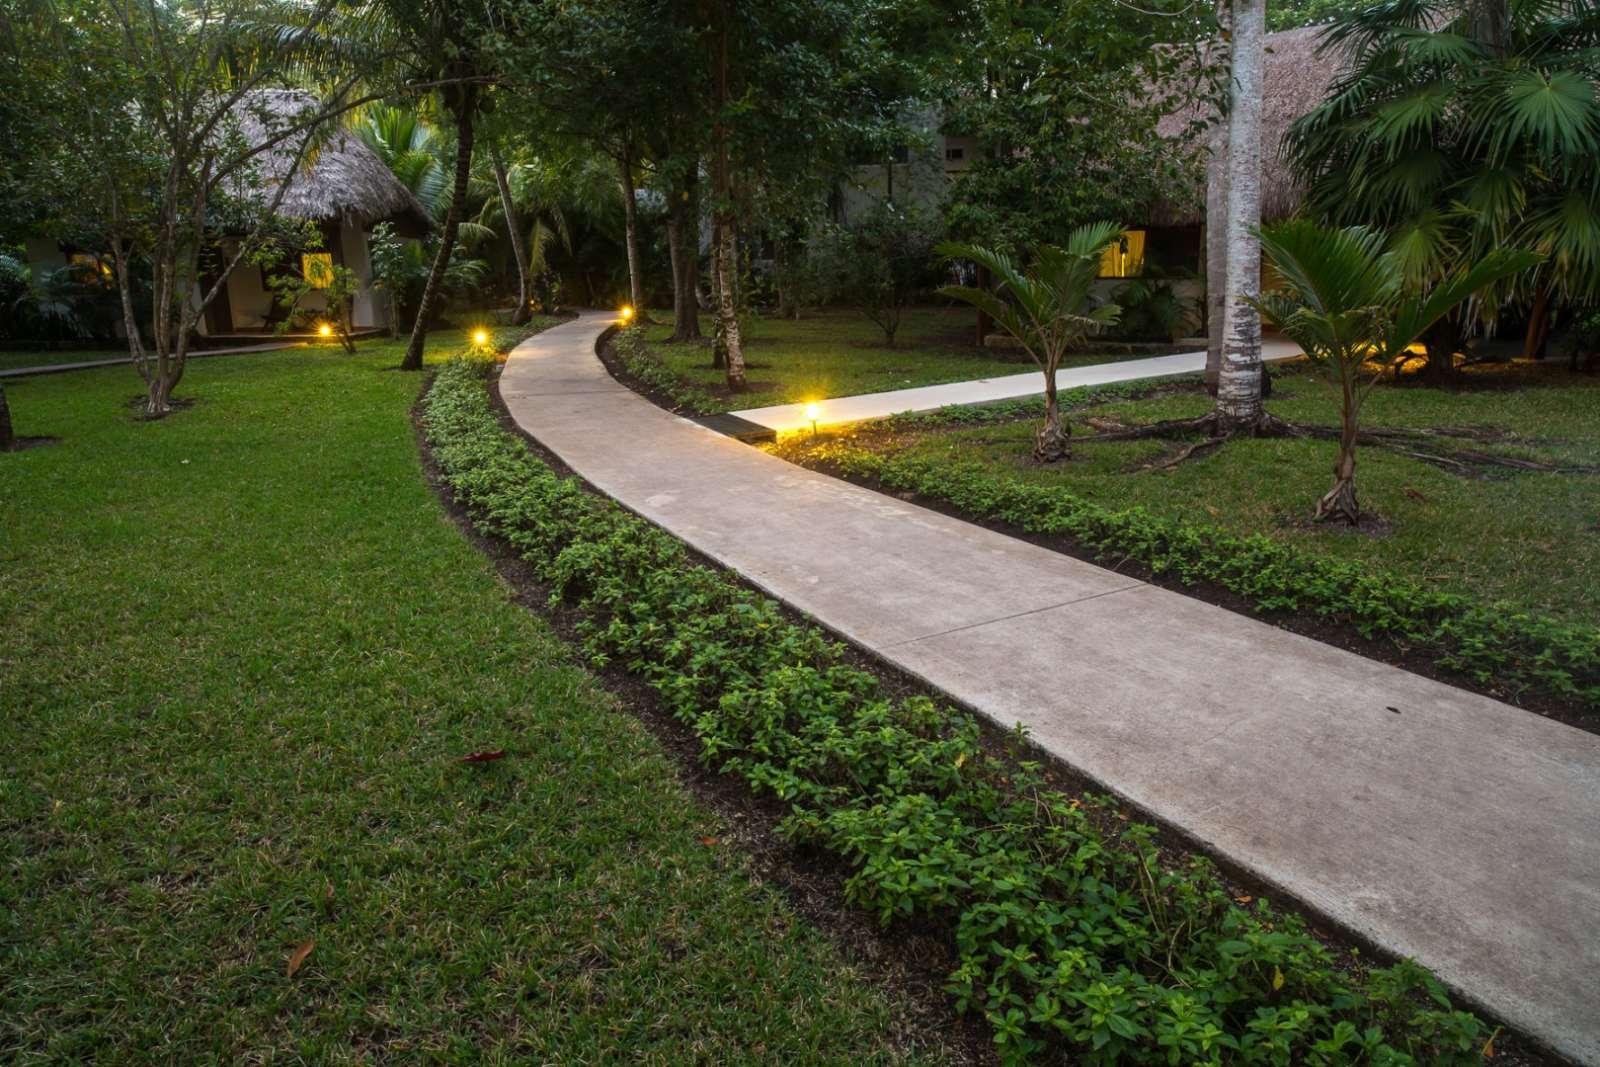 Pathway at Rancho Encantado Bacalar